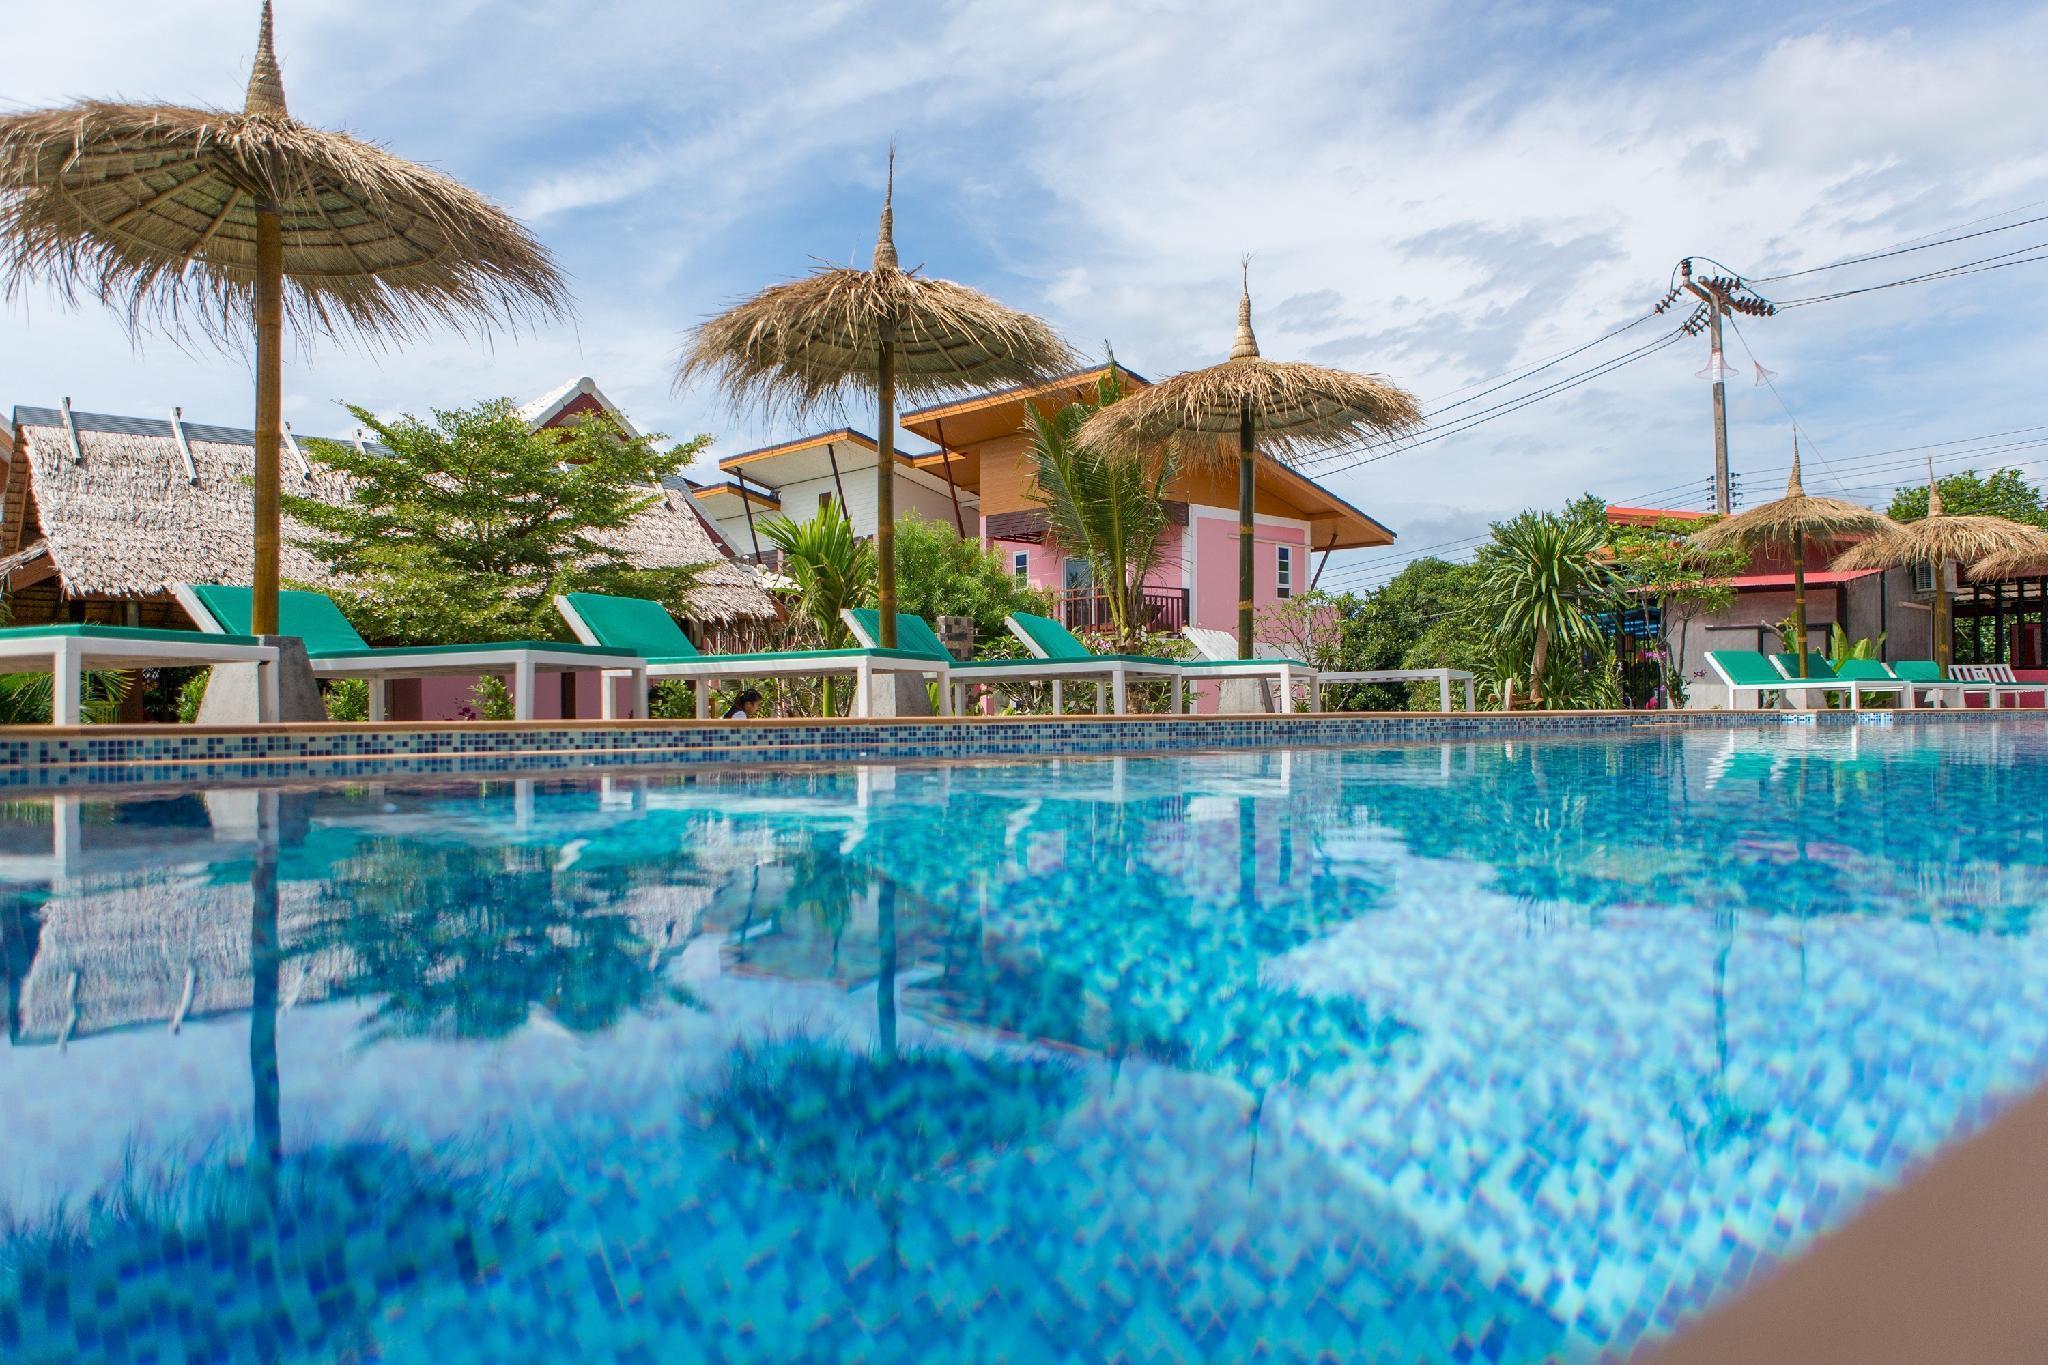 Pinky Bungalows Resort พิงค์กี้ บังกะโล รีสอร์ต